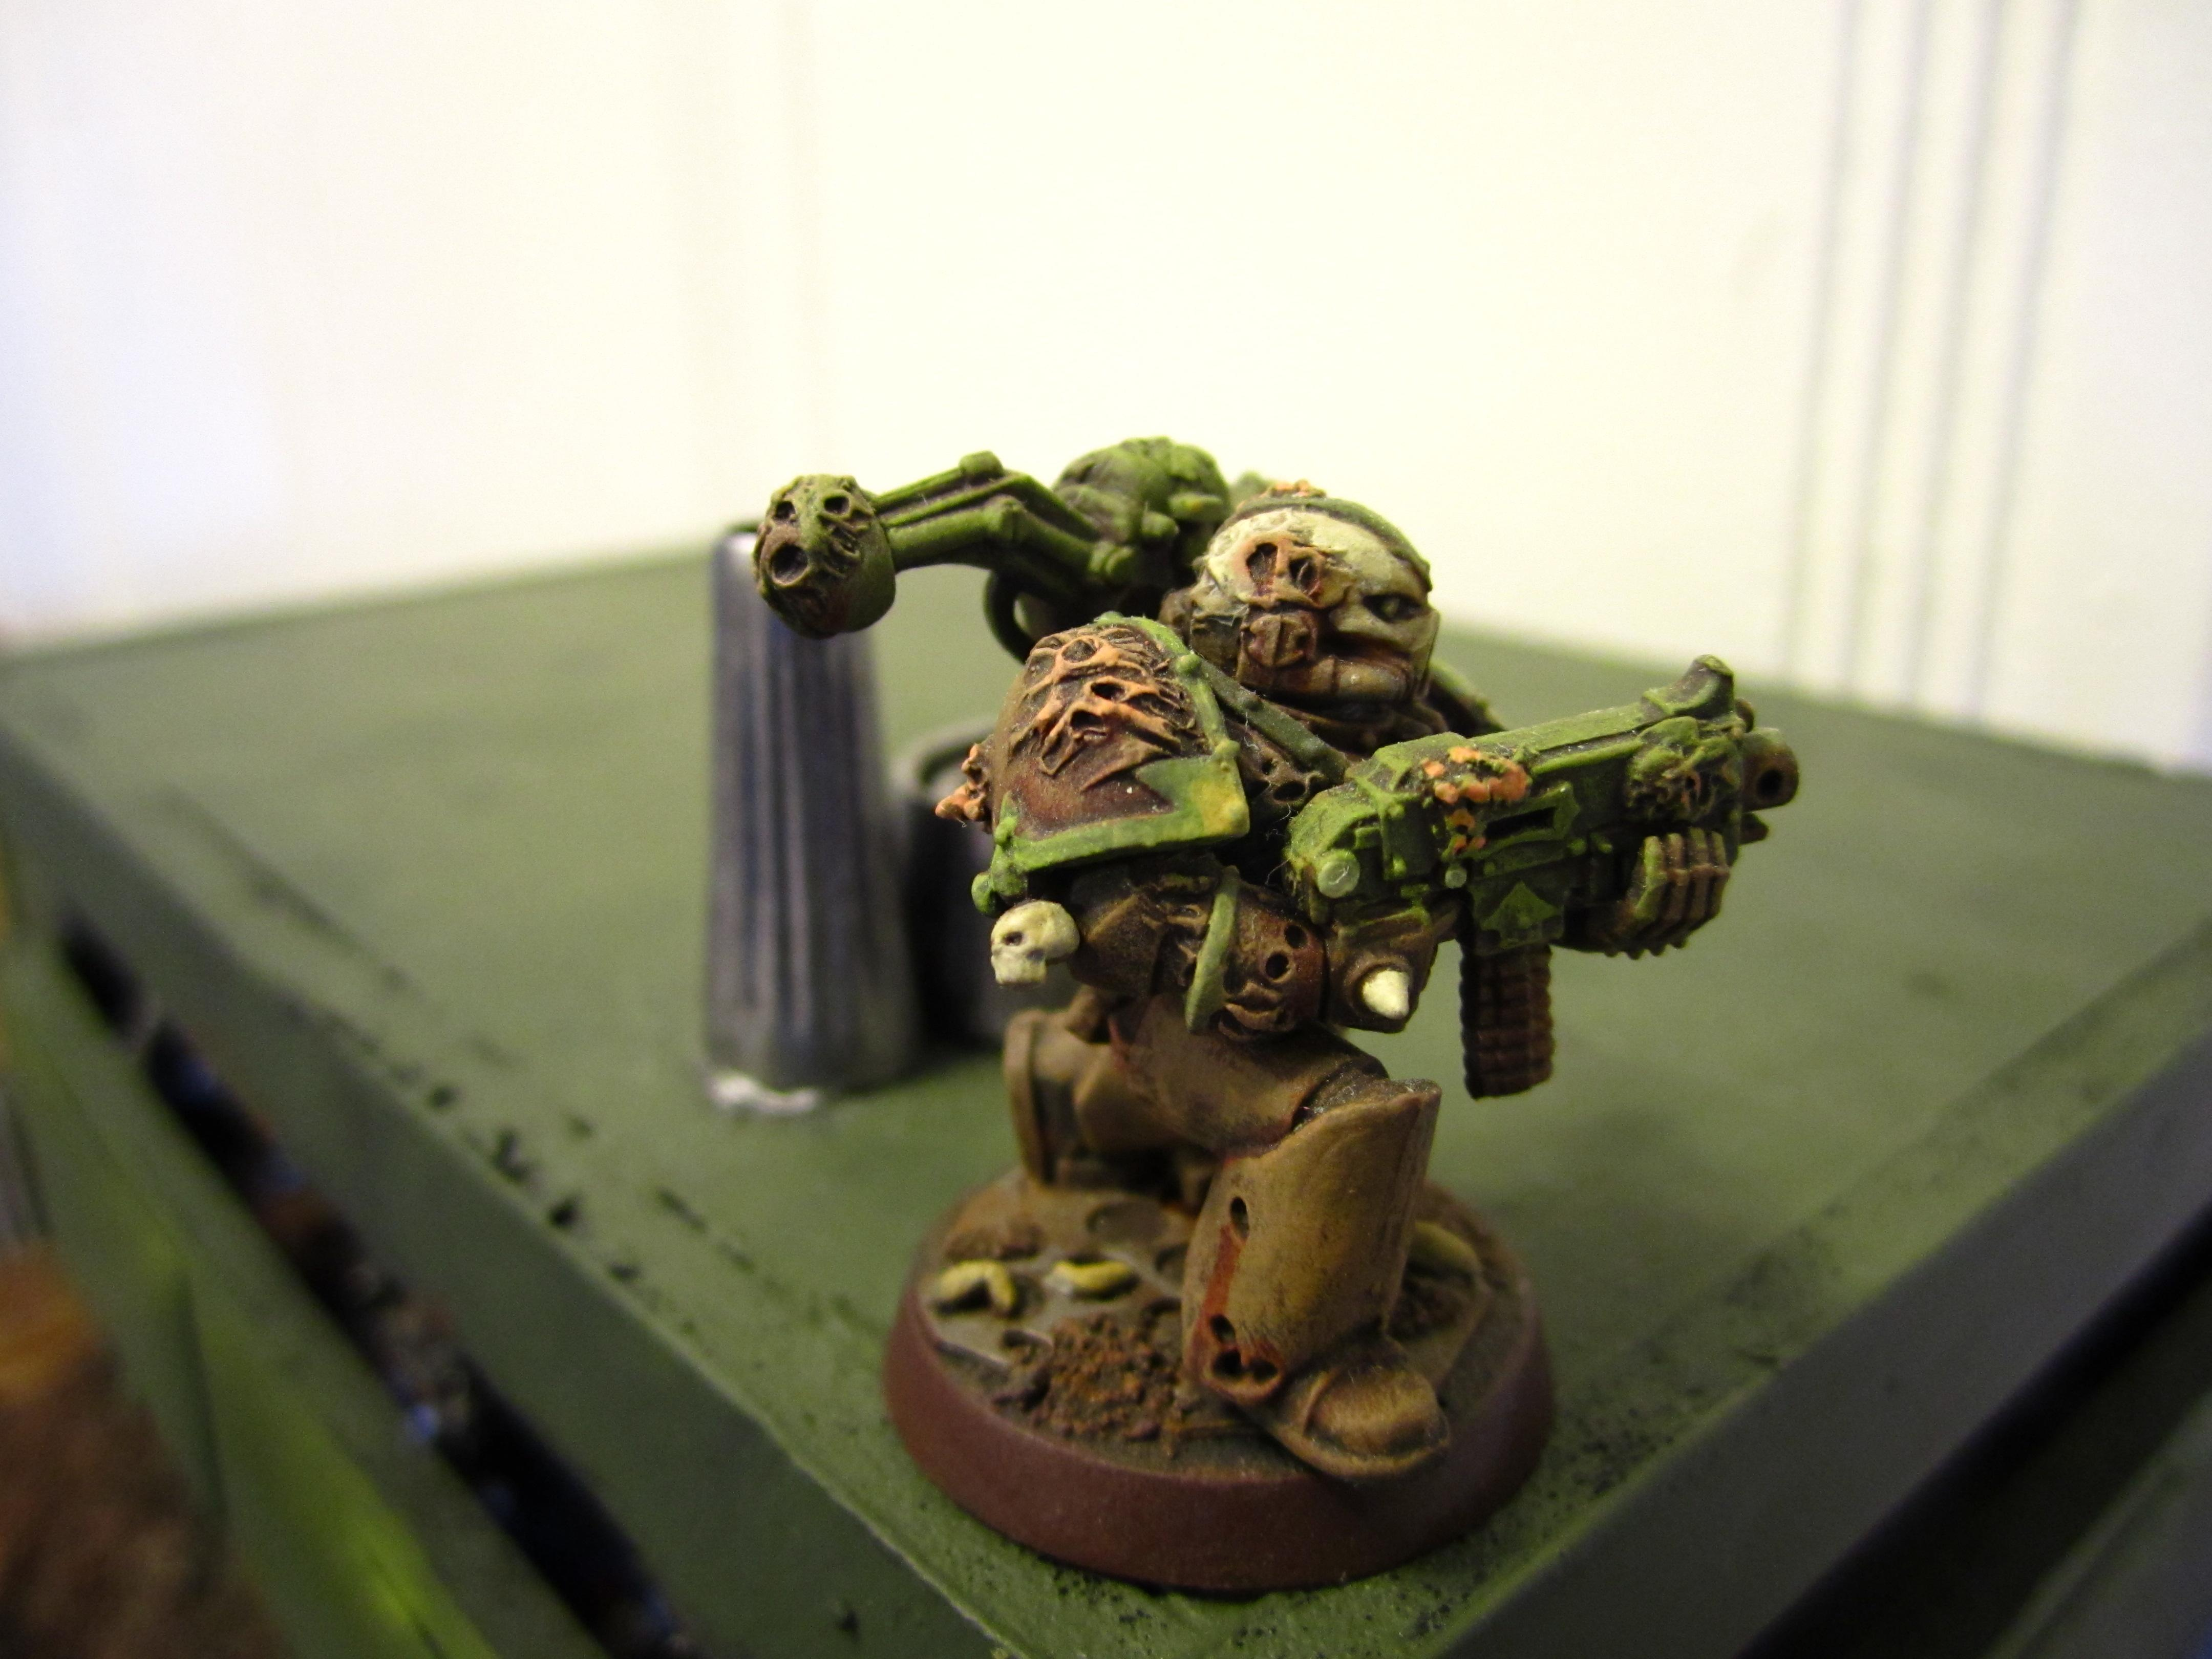 Chaos Space Marines, Conversion, Death Guard, Nurgle, Plague Marines, Warhammer 40,000